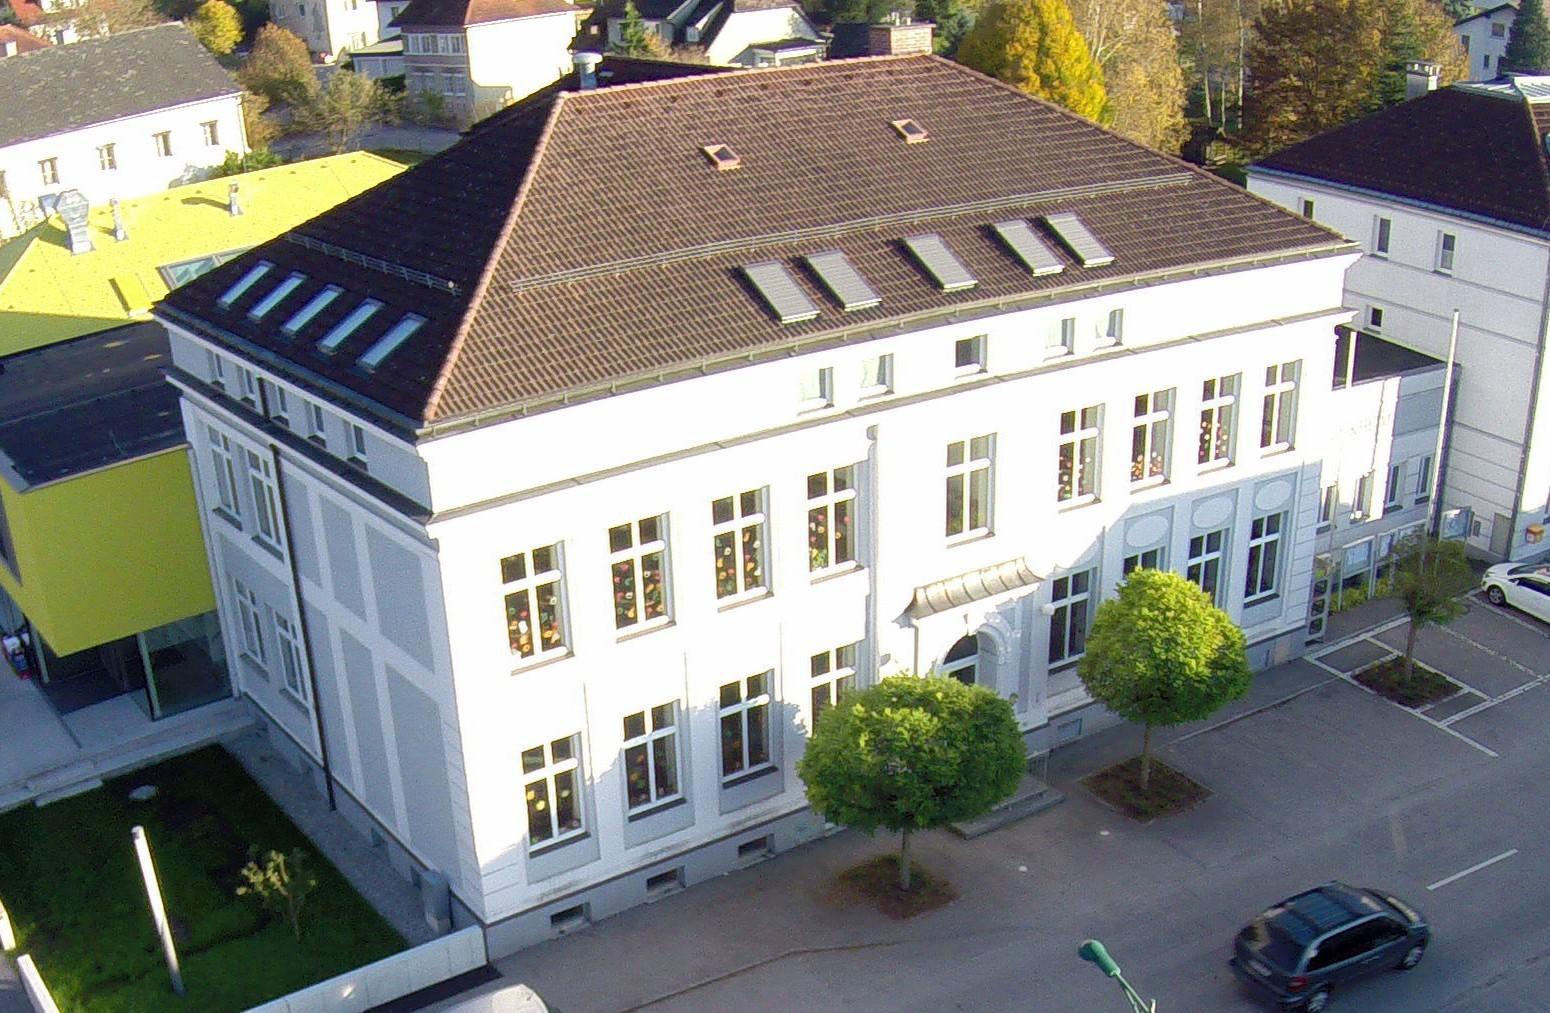 Volksschule2.jpg